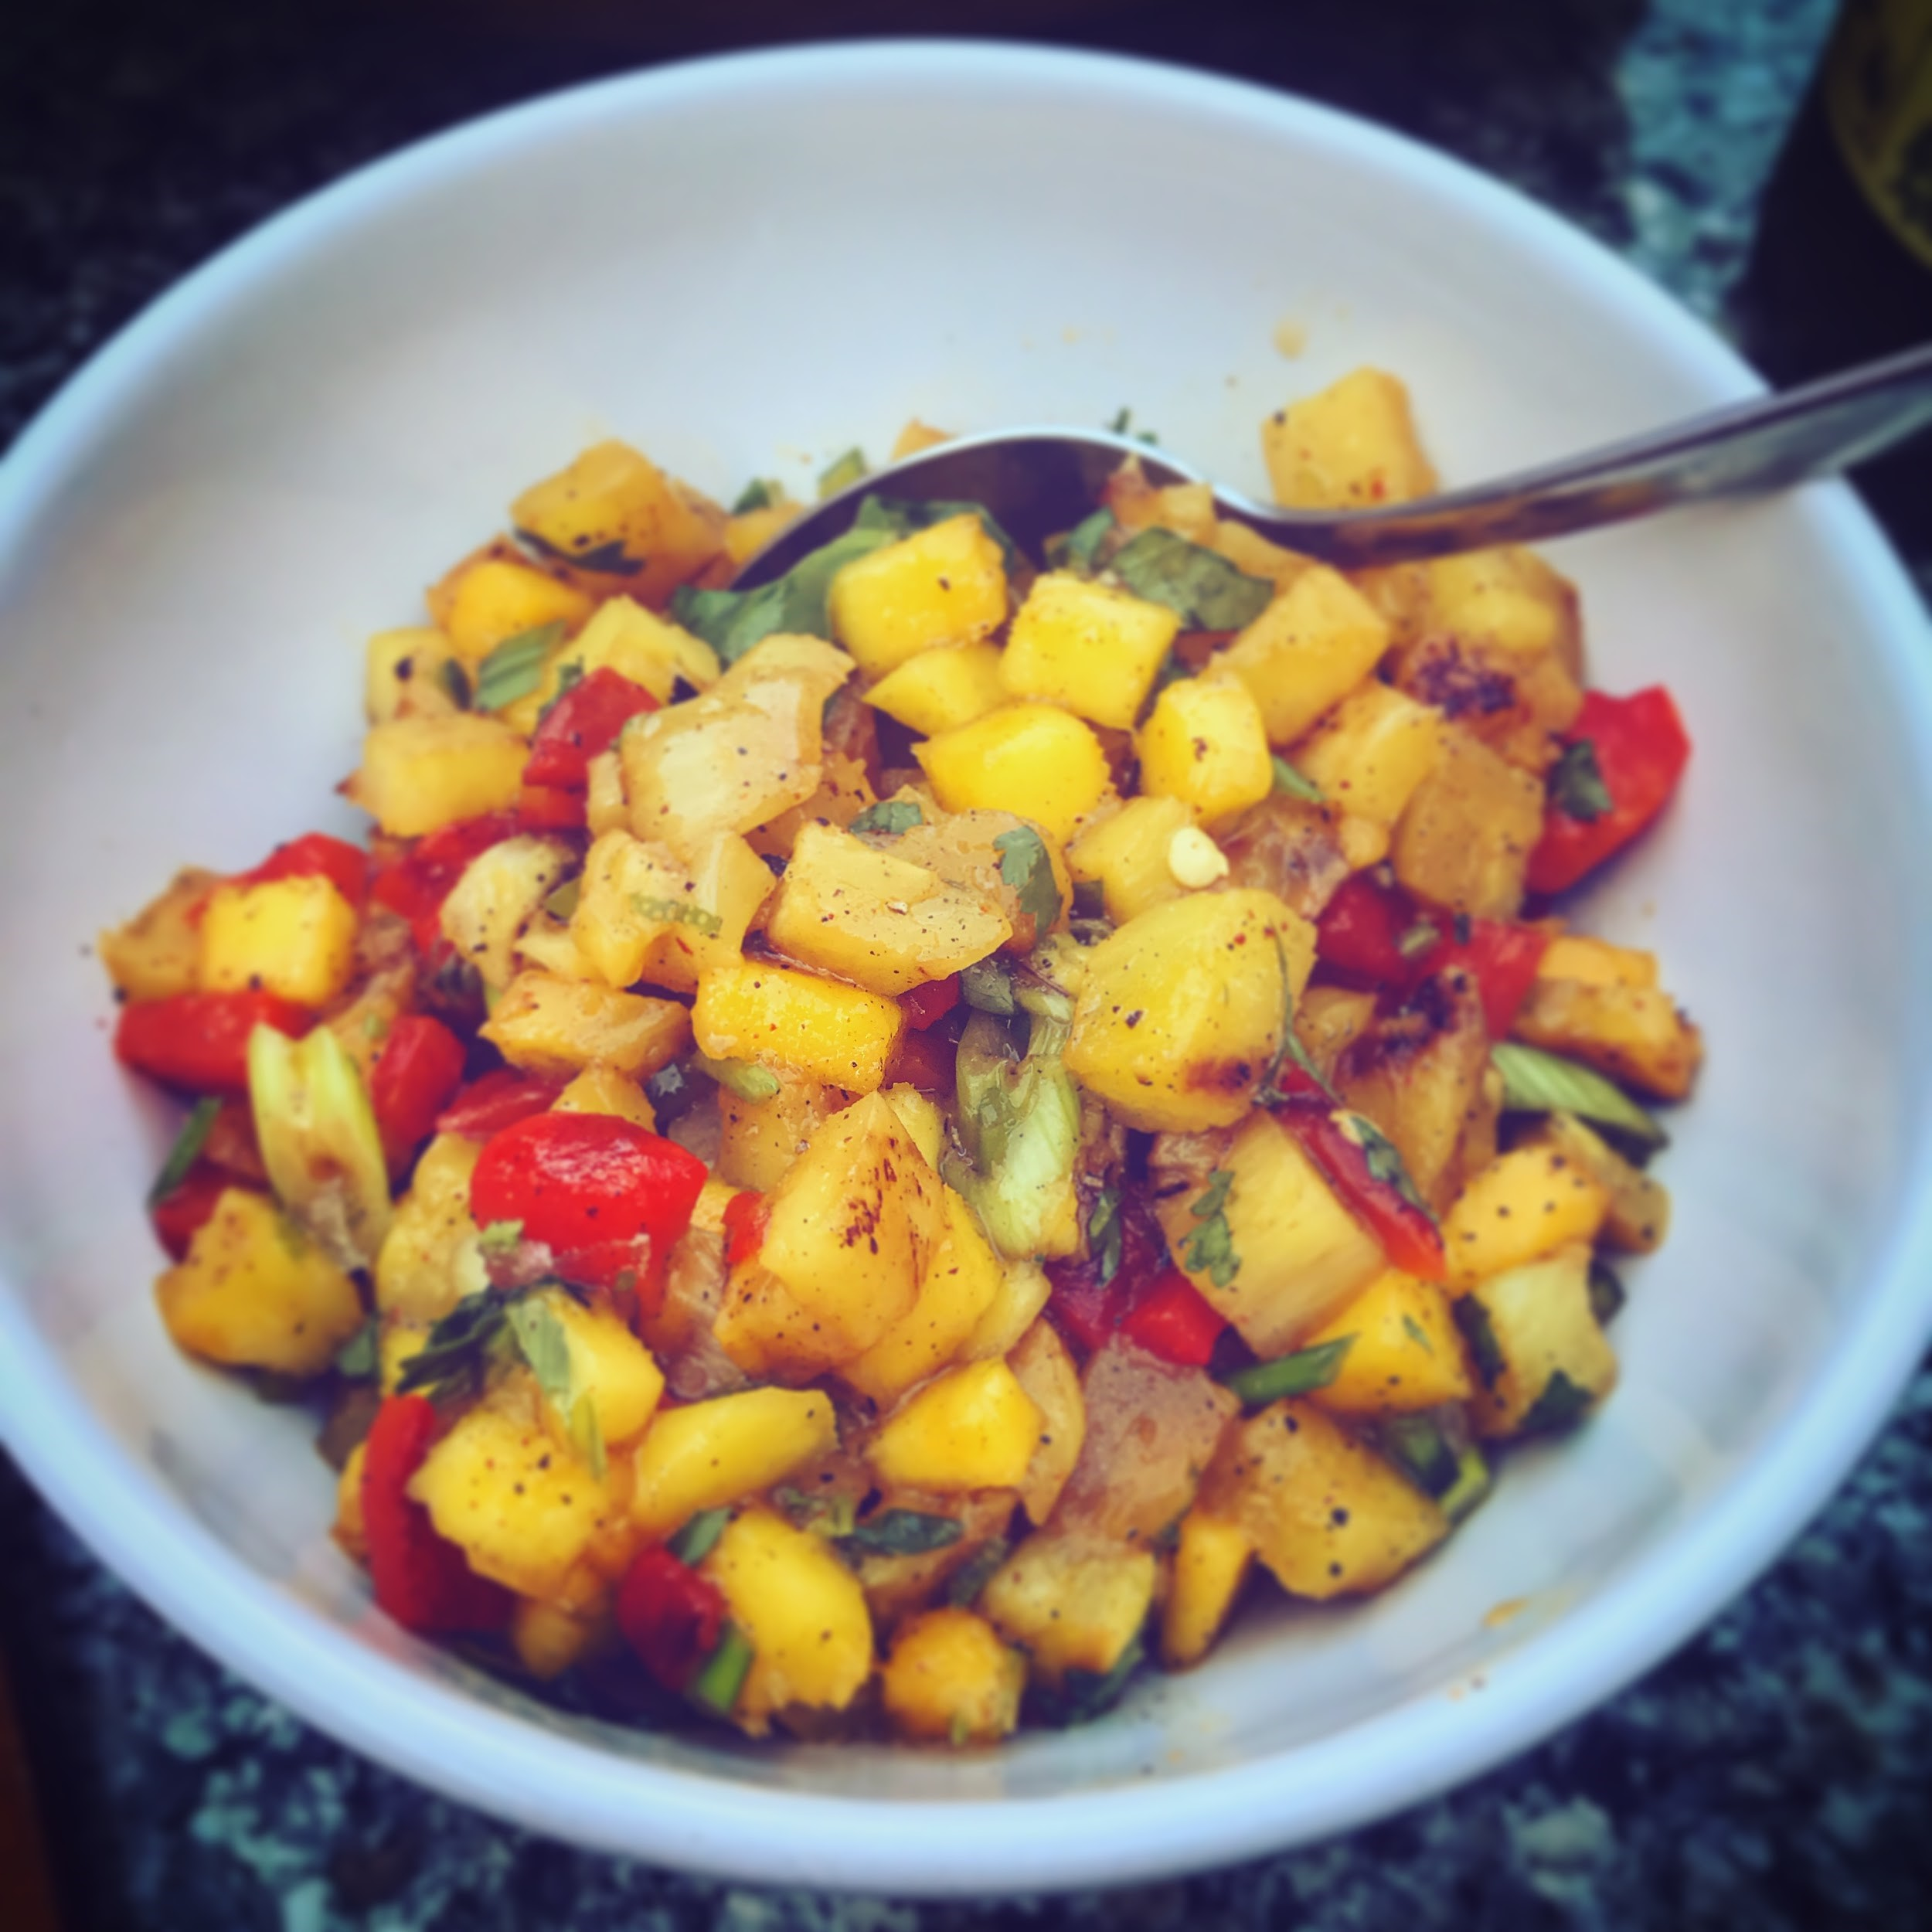 grilledfruitsalad